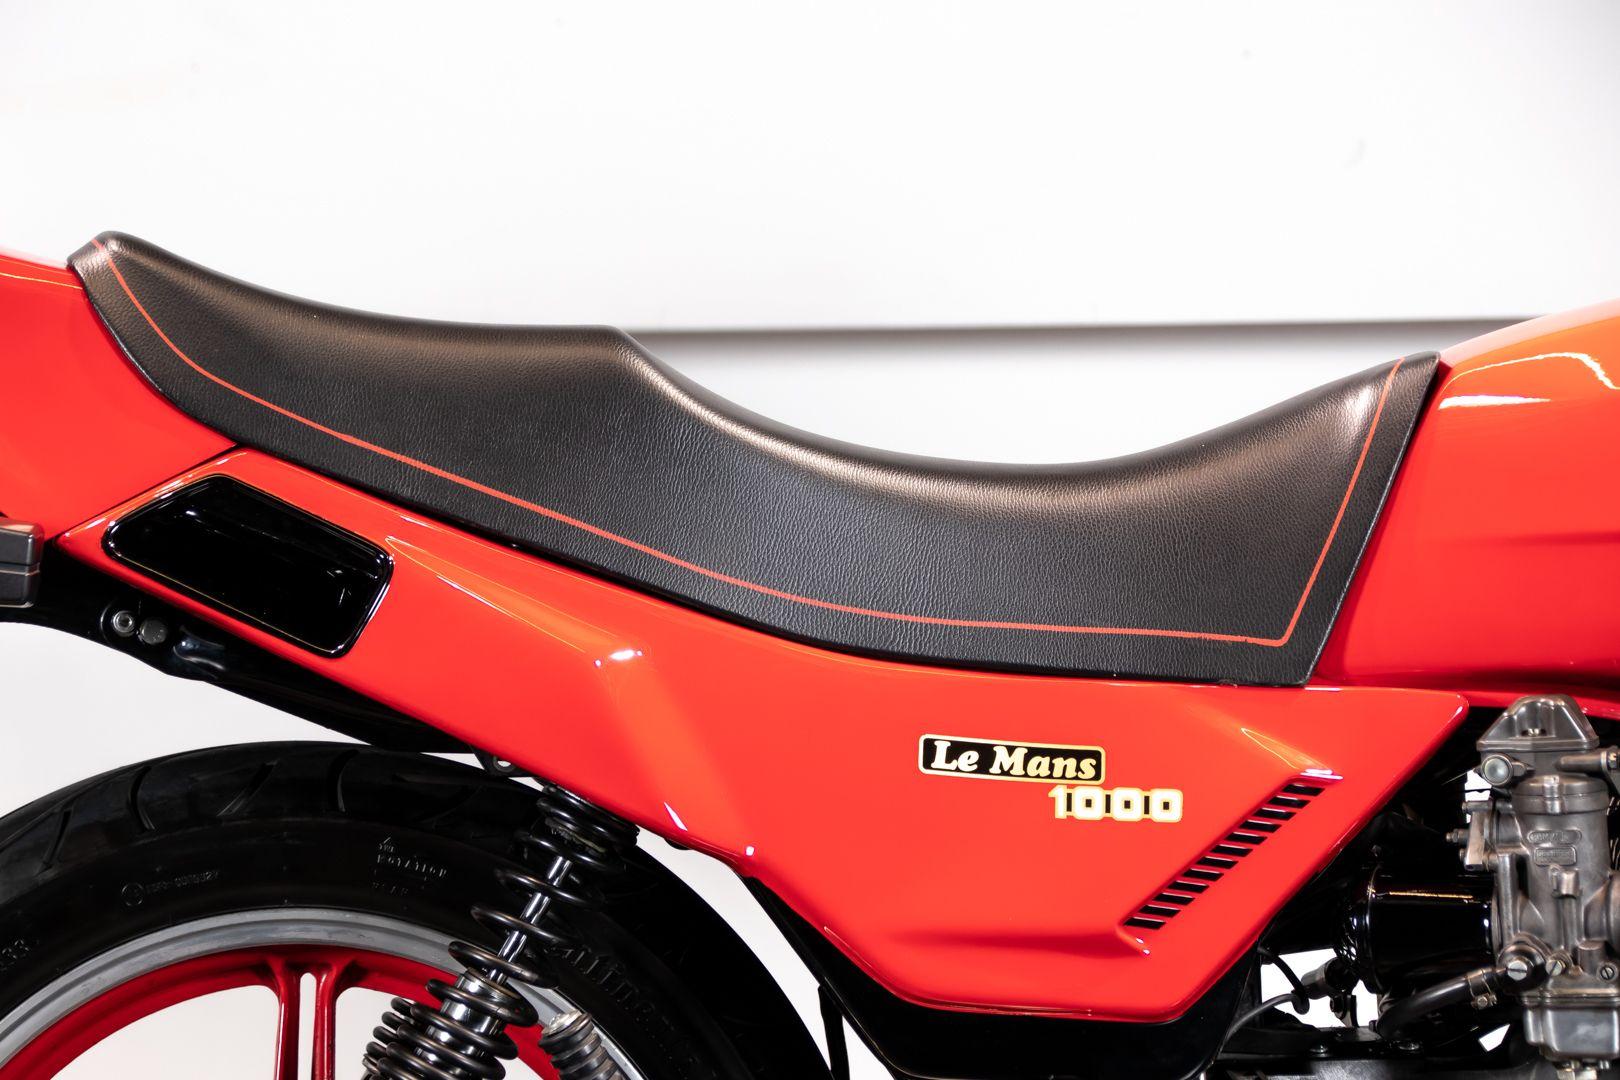 1985 Moto Guzzi le mans 1000 57530